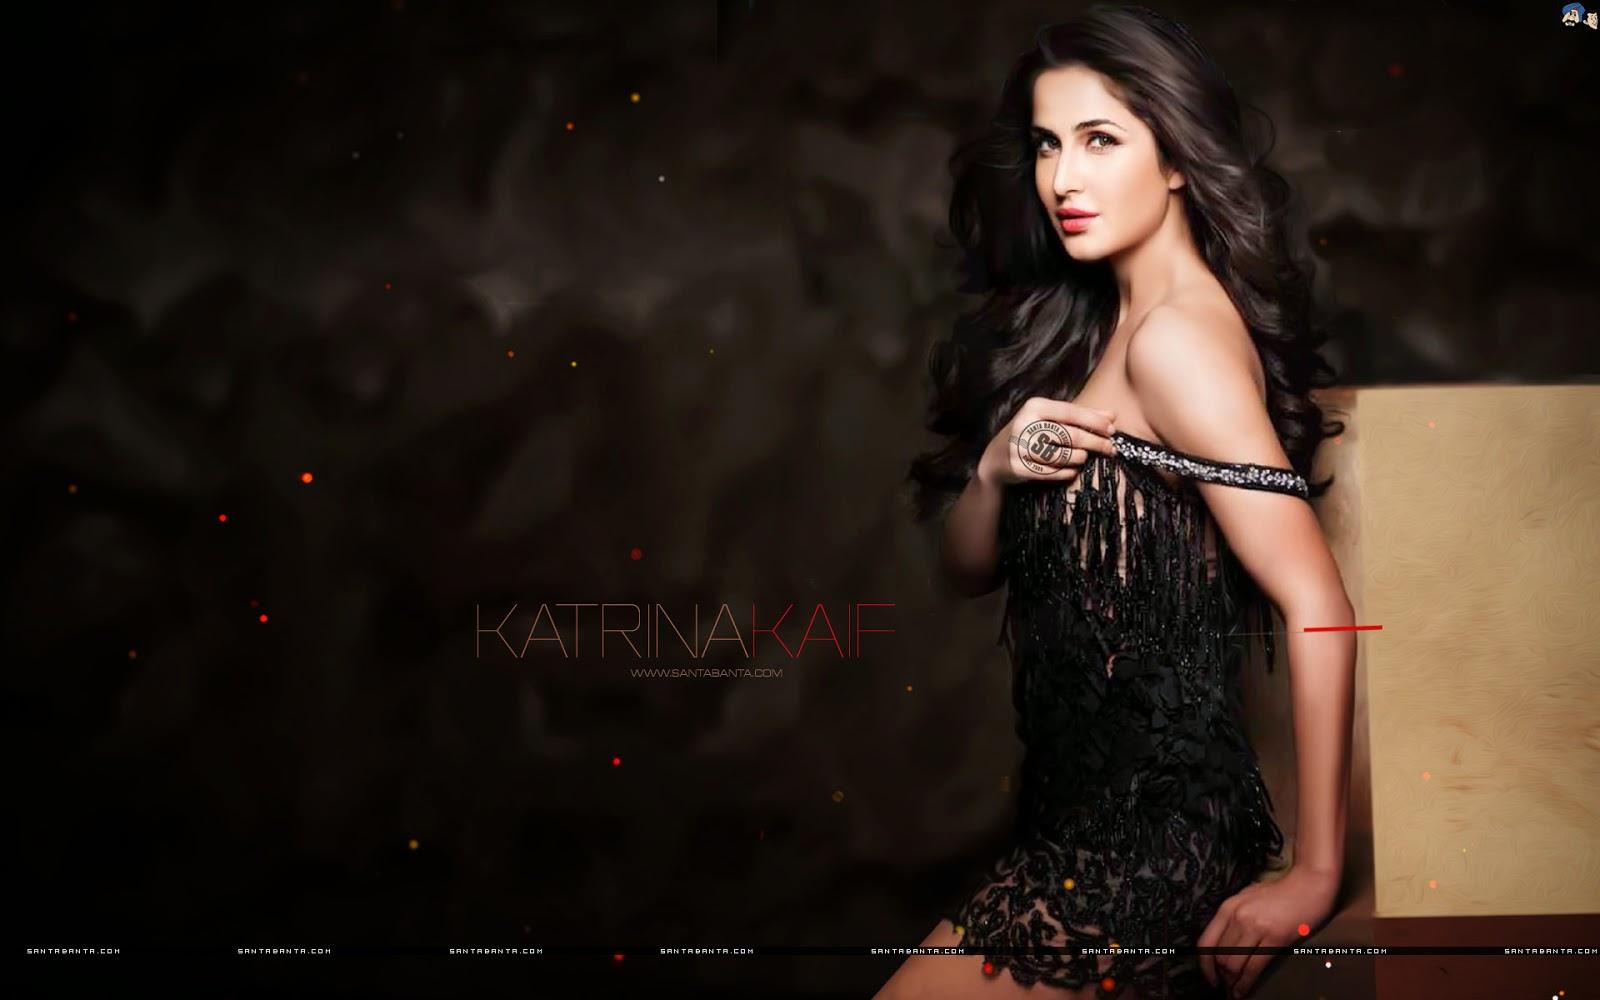 Katrina Kaif Seksi Wallpaper 15